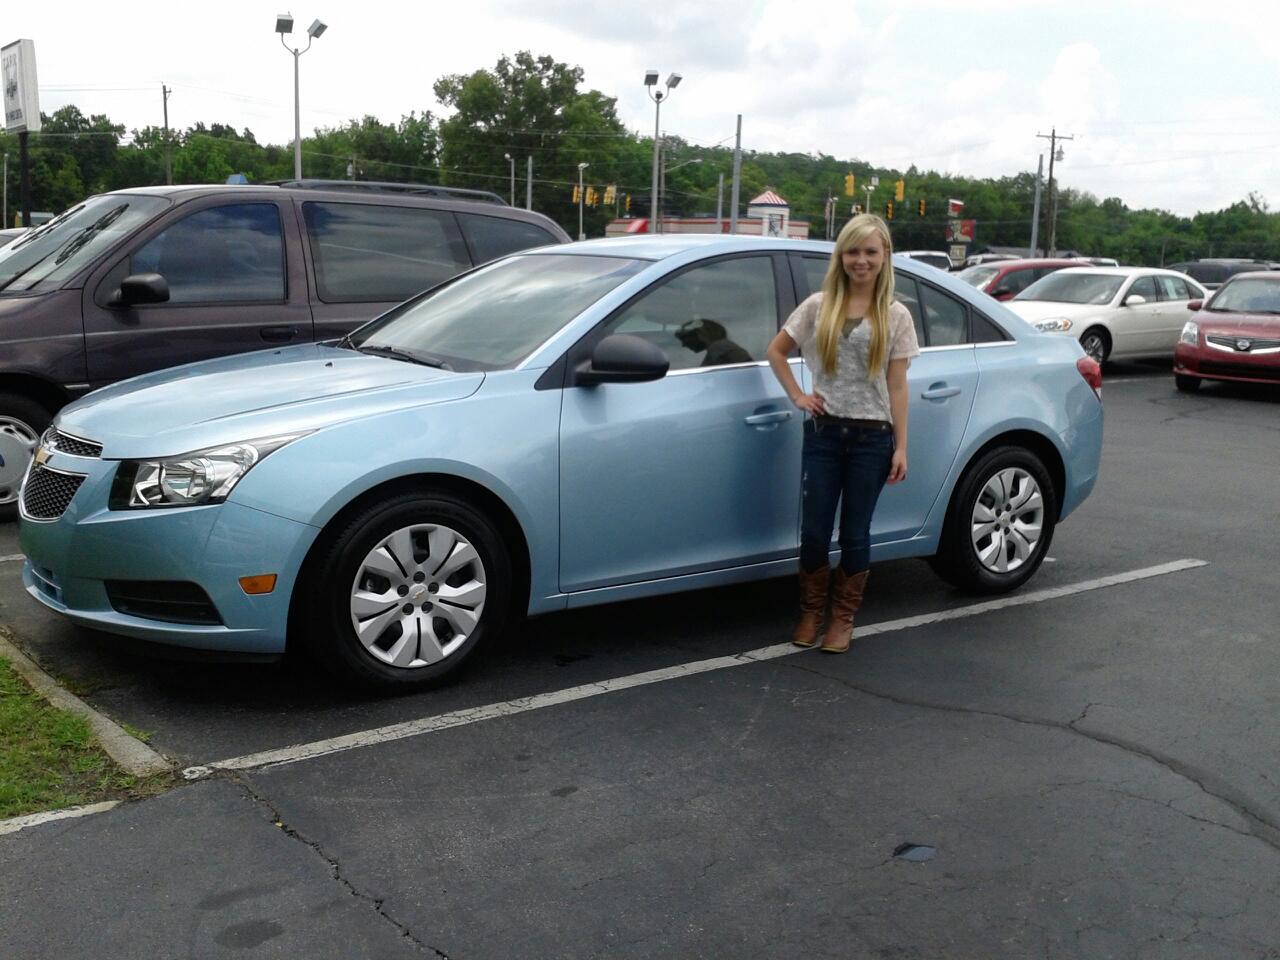 Tarr Chevrolet Co Inc, Jefferson City TN